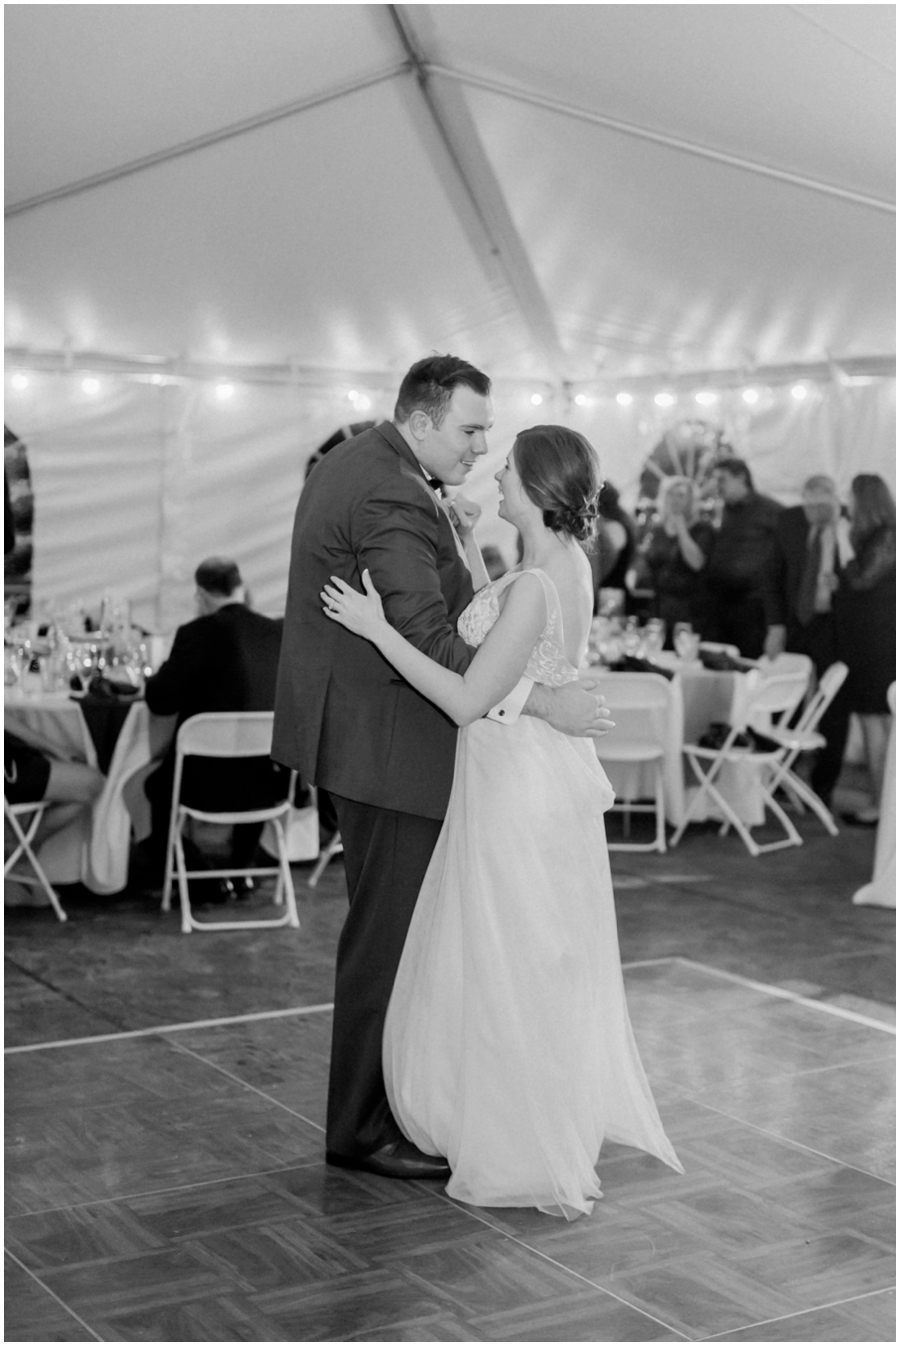 Southern Missouri Outdoor Wedding Photos   Film Photography